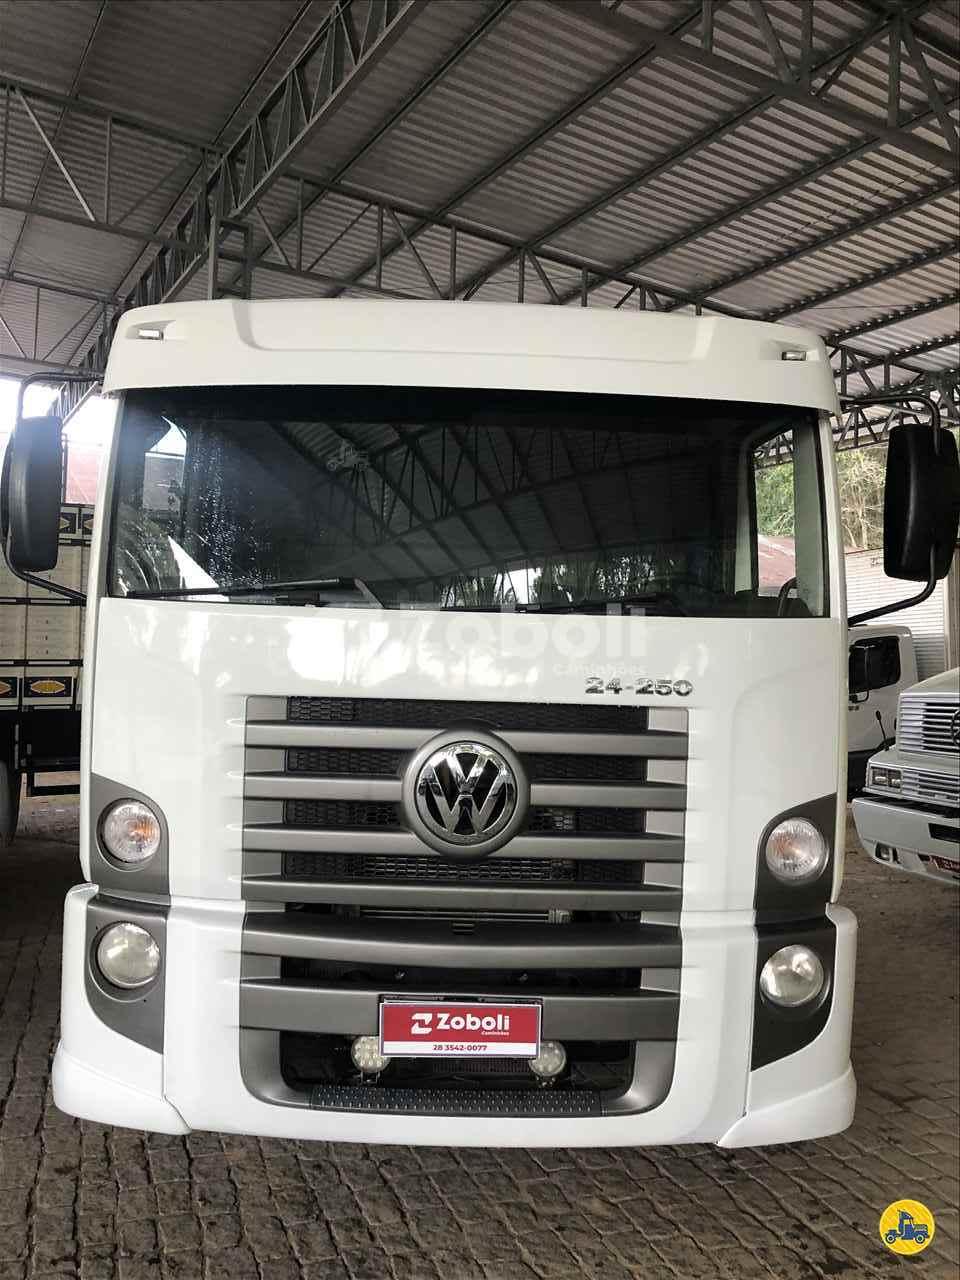 CAMINHAO VOLKSWAGEN VW 24250 Chassis Truck 6x2 Zoboli Caminhões CASTELO ESPÍRITO SANTO ES